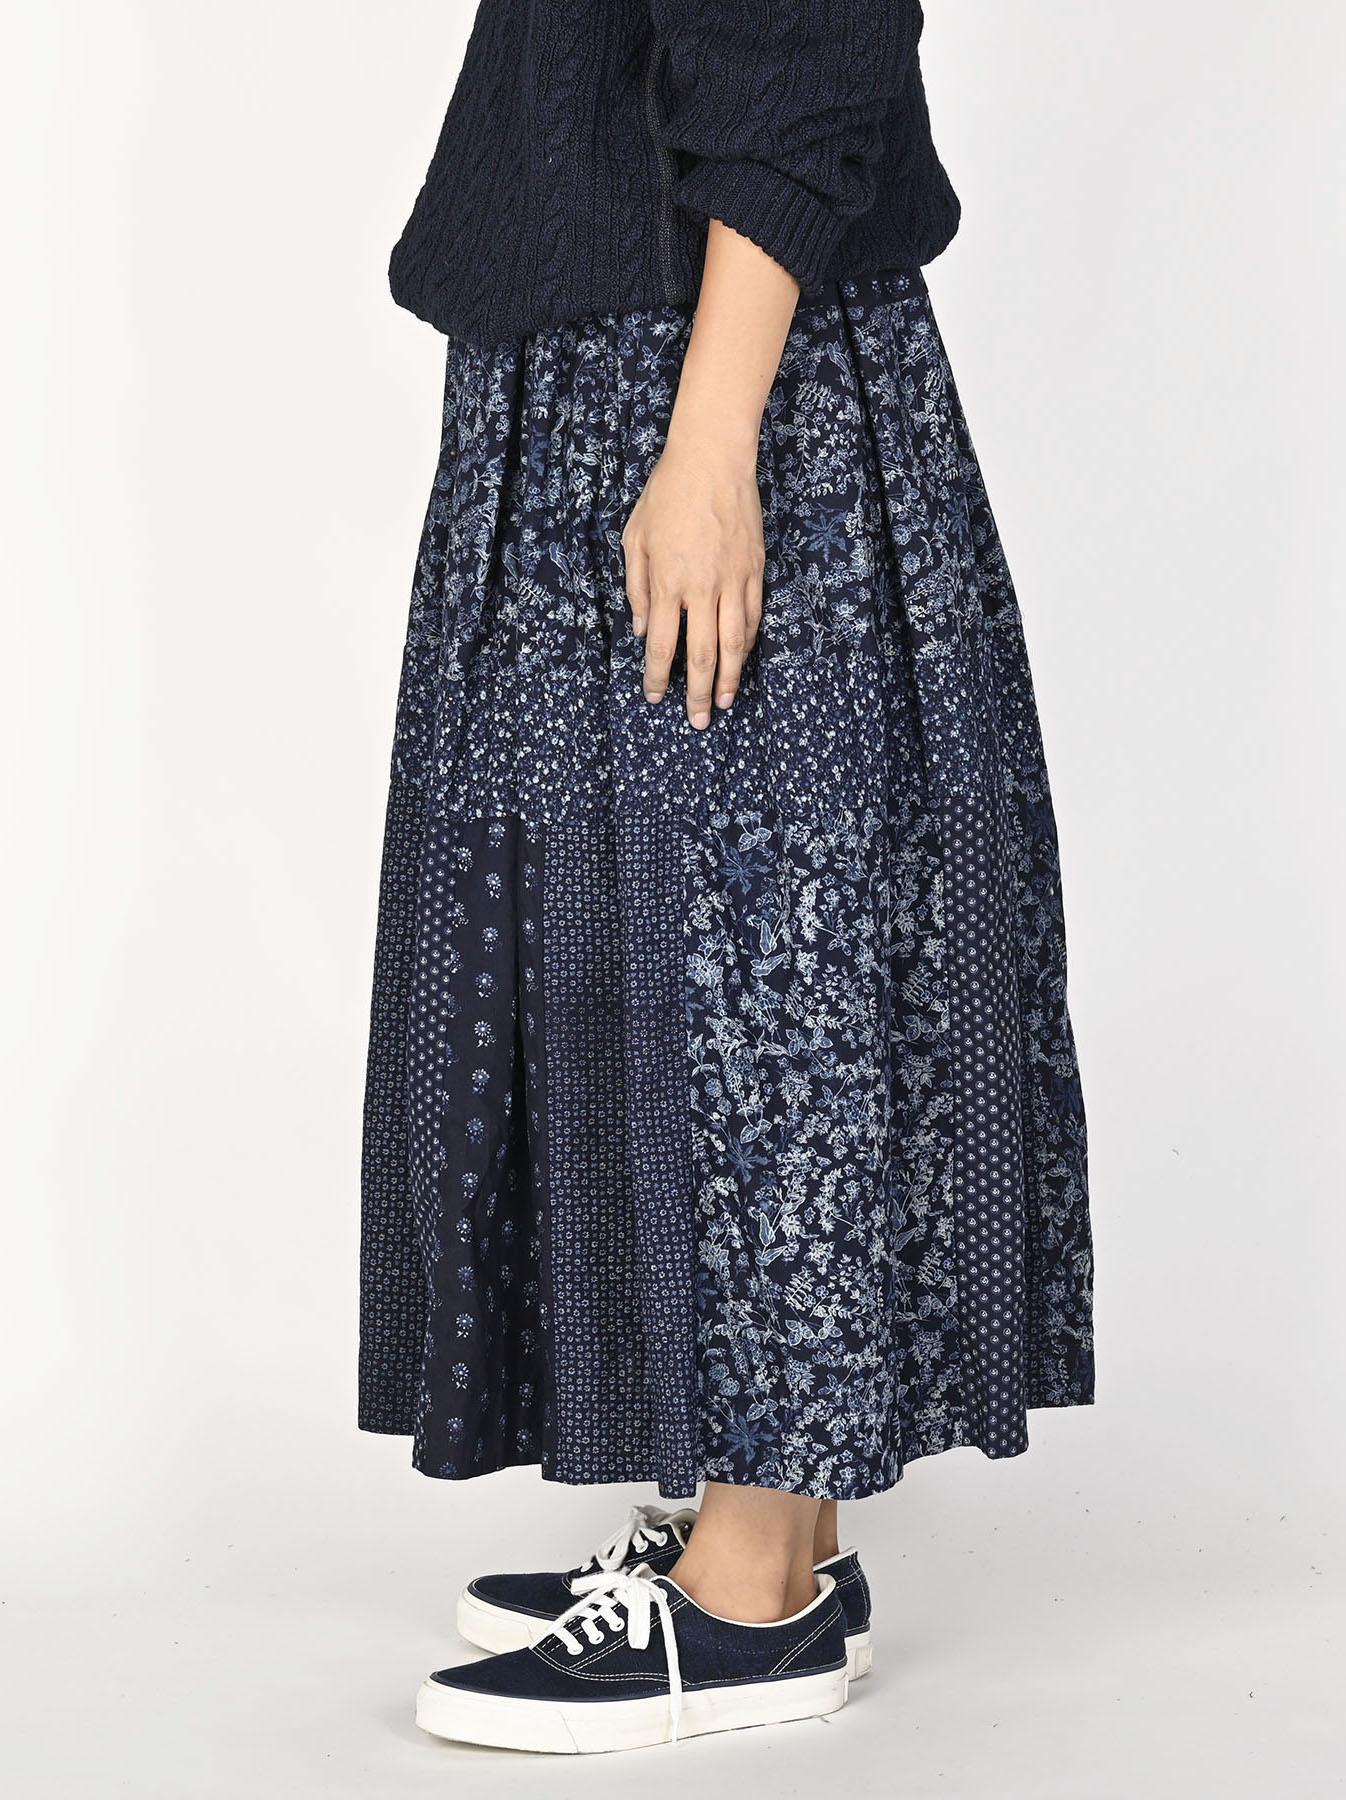 Indigo Tappet Flower Patchwork Skirt-3